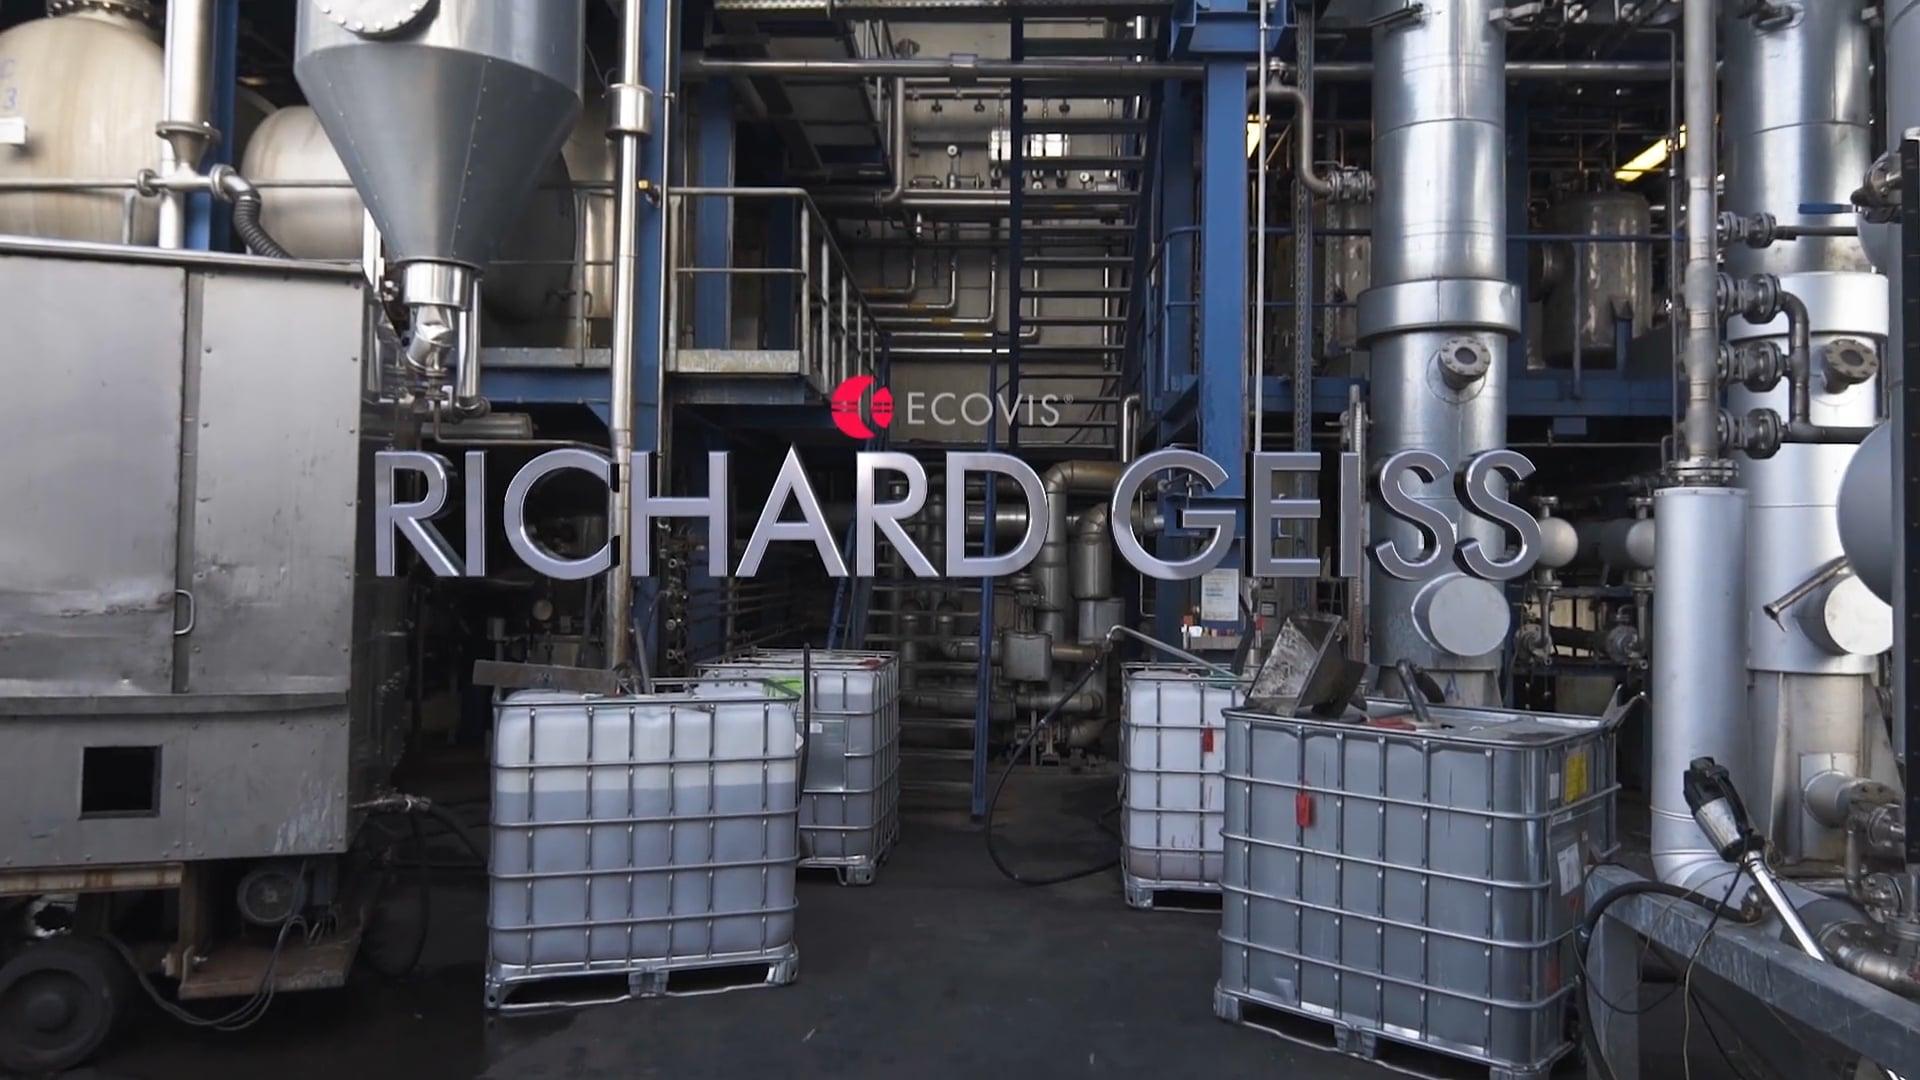 Ecovis - Richard Geiss (Upclose Version)